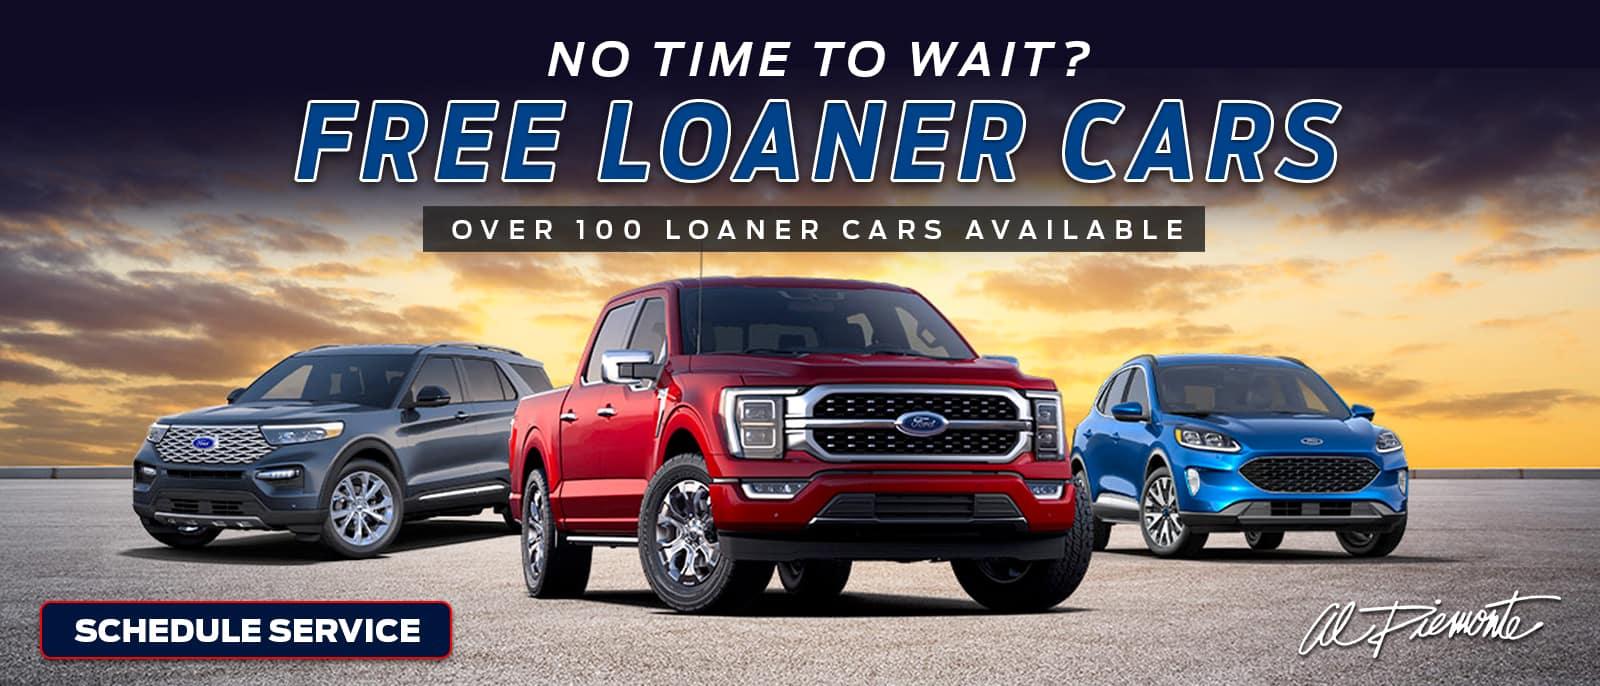 Loaners-july